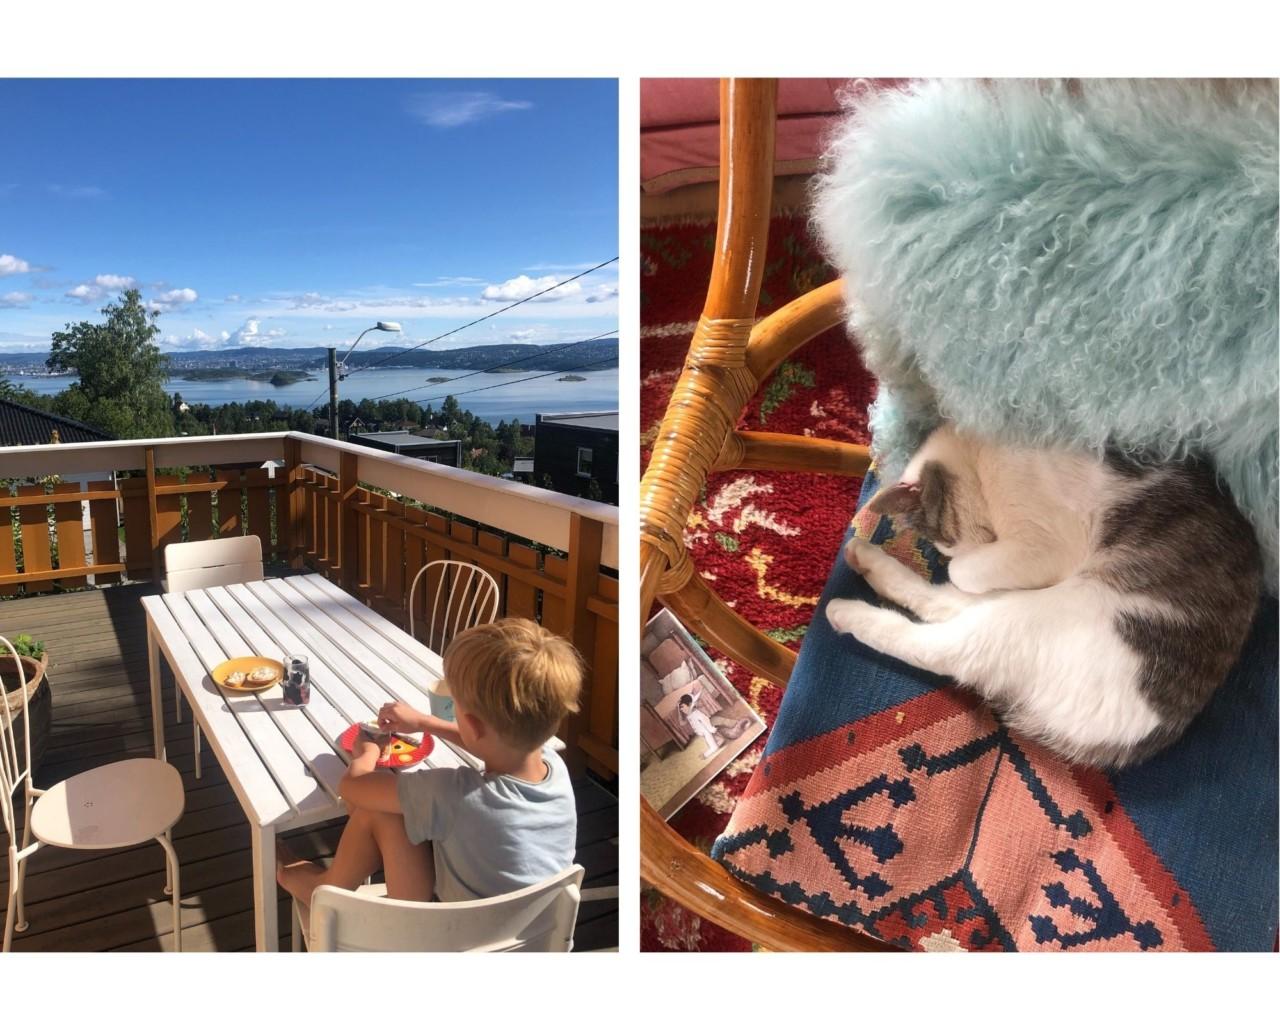 terrasse-havutsikt-nesodden-oslo-katt-sover